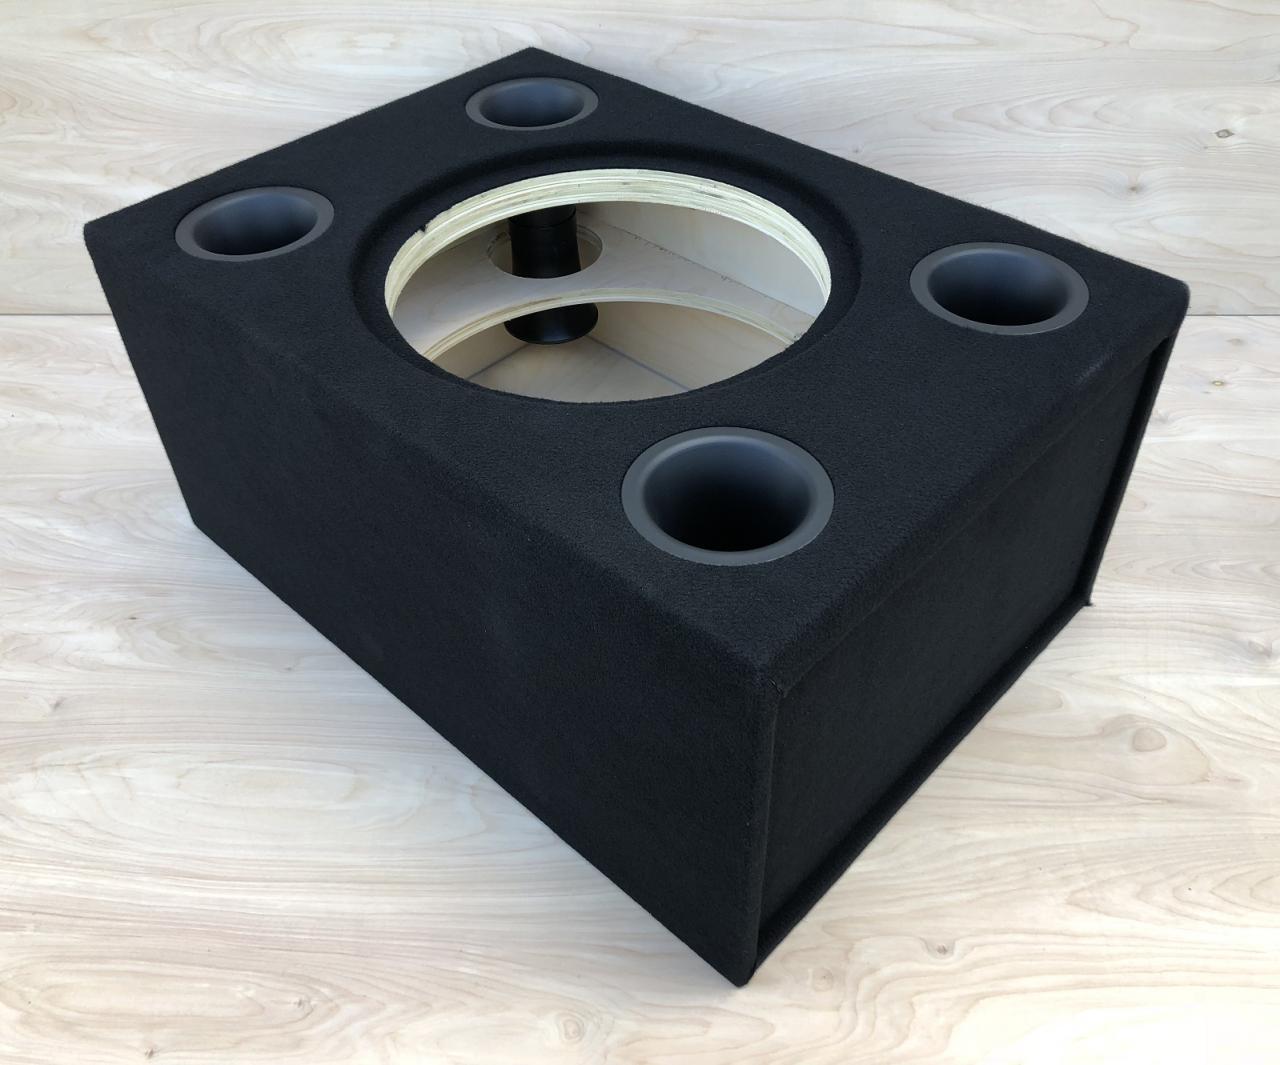 Custom Ported Sub Enclosure Box for a 15